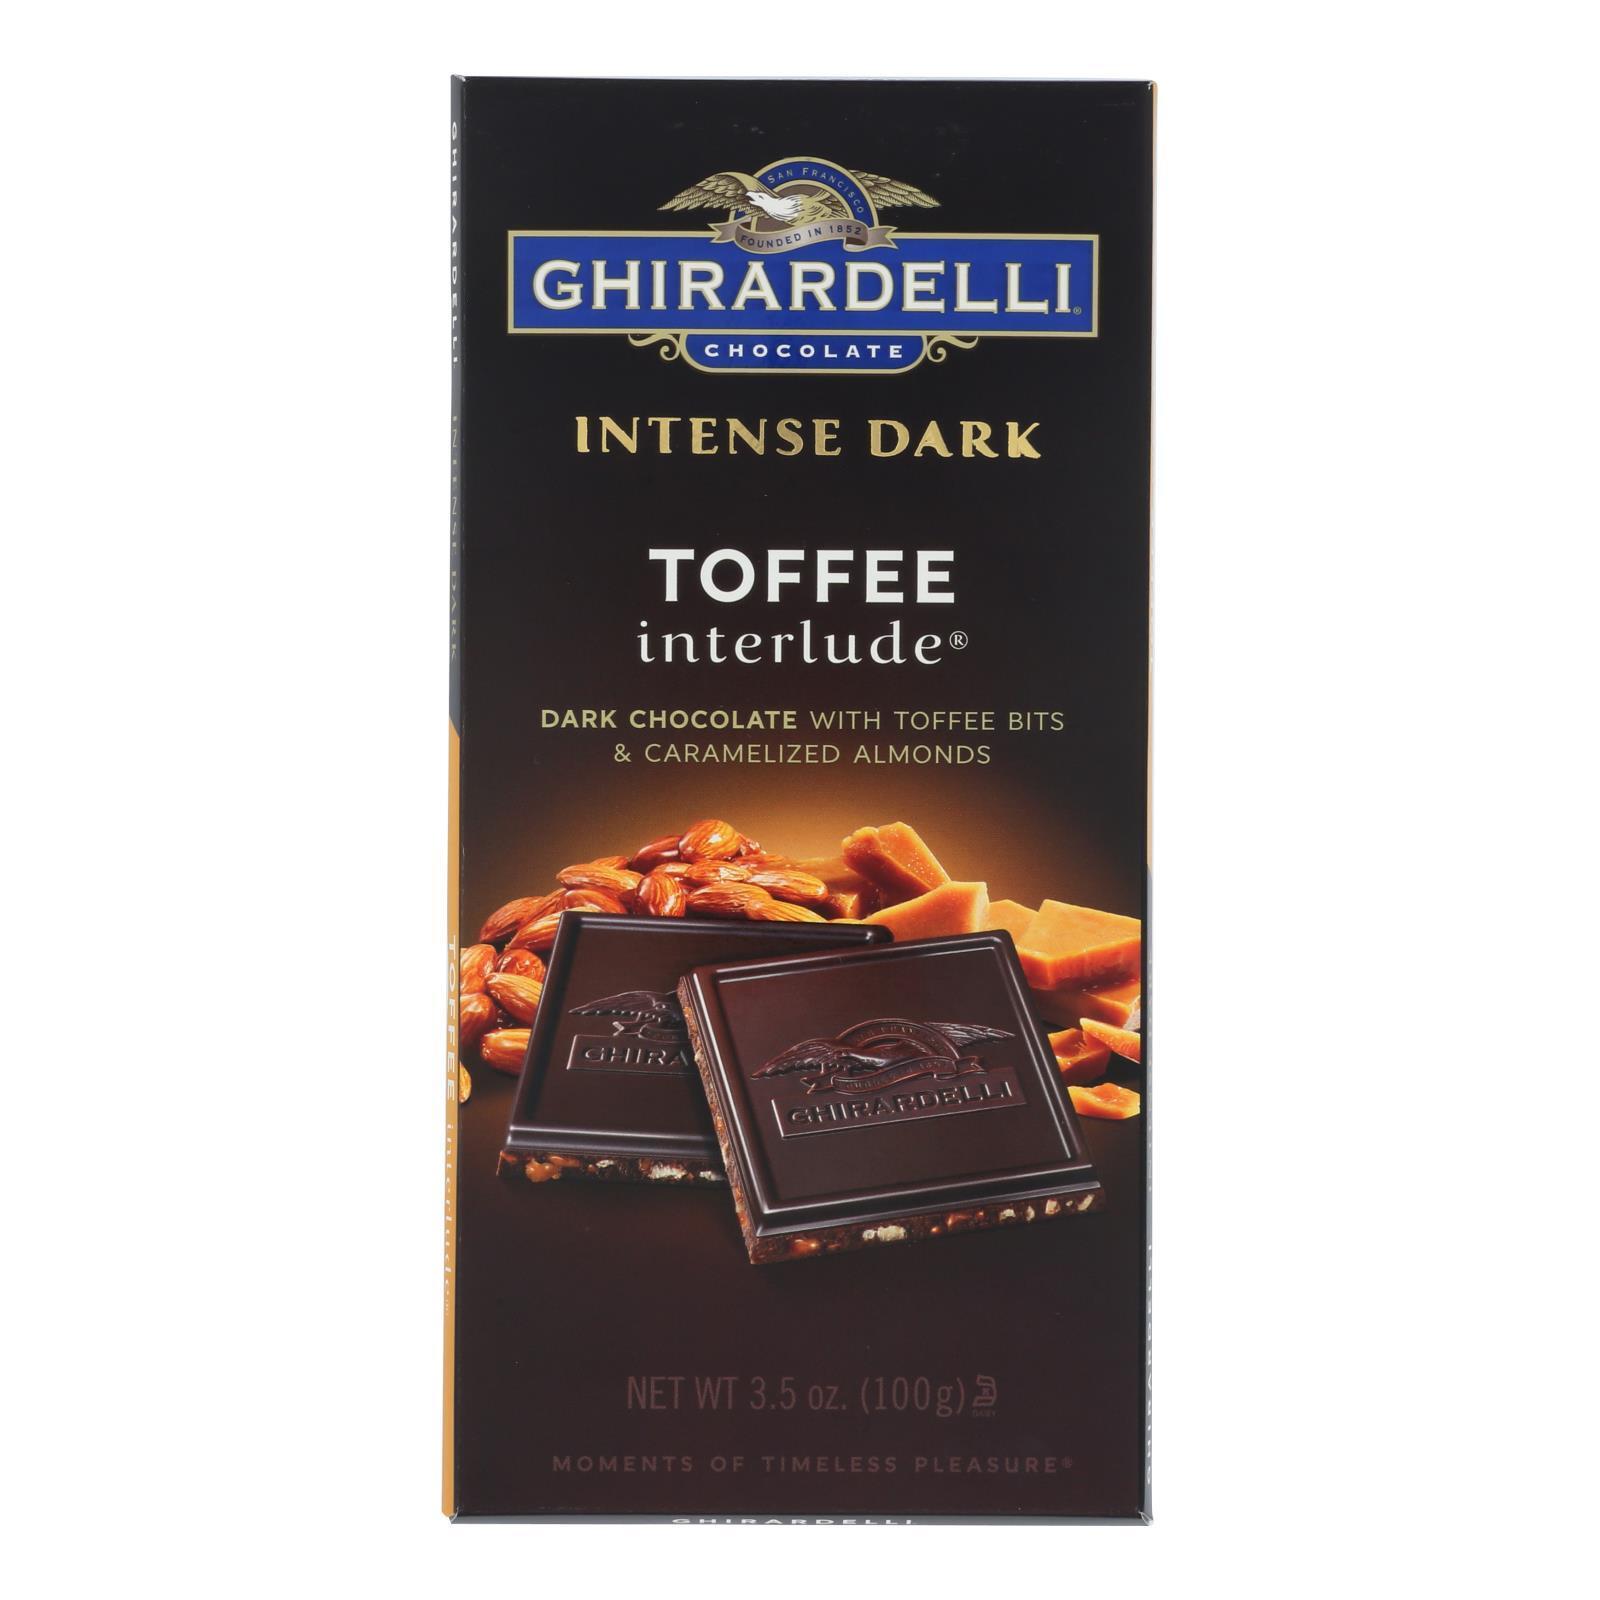 Ghirardelli Intense Dark Chocolate Toffee Interlude Bar - Case of 12 - 3.5 oz.